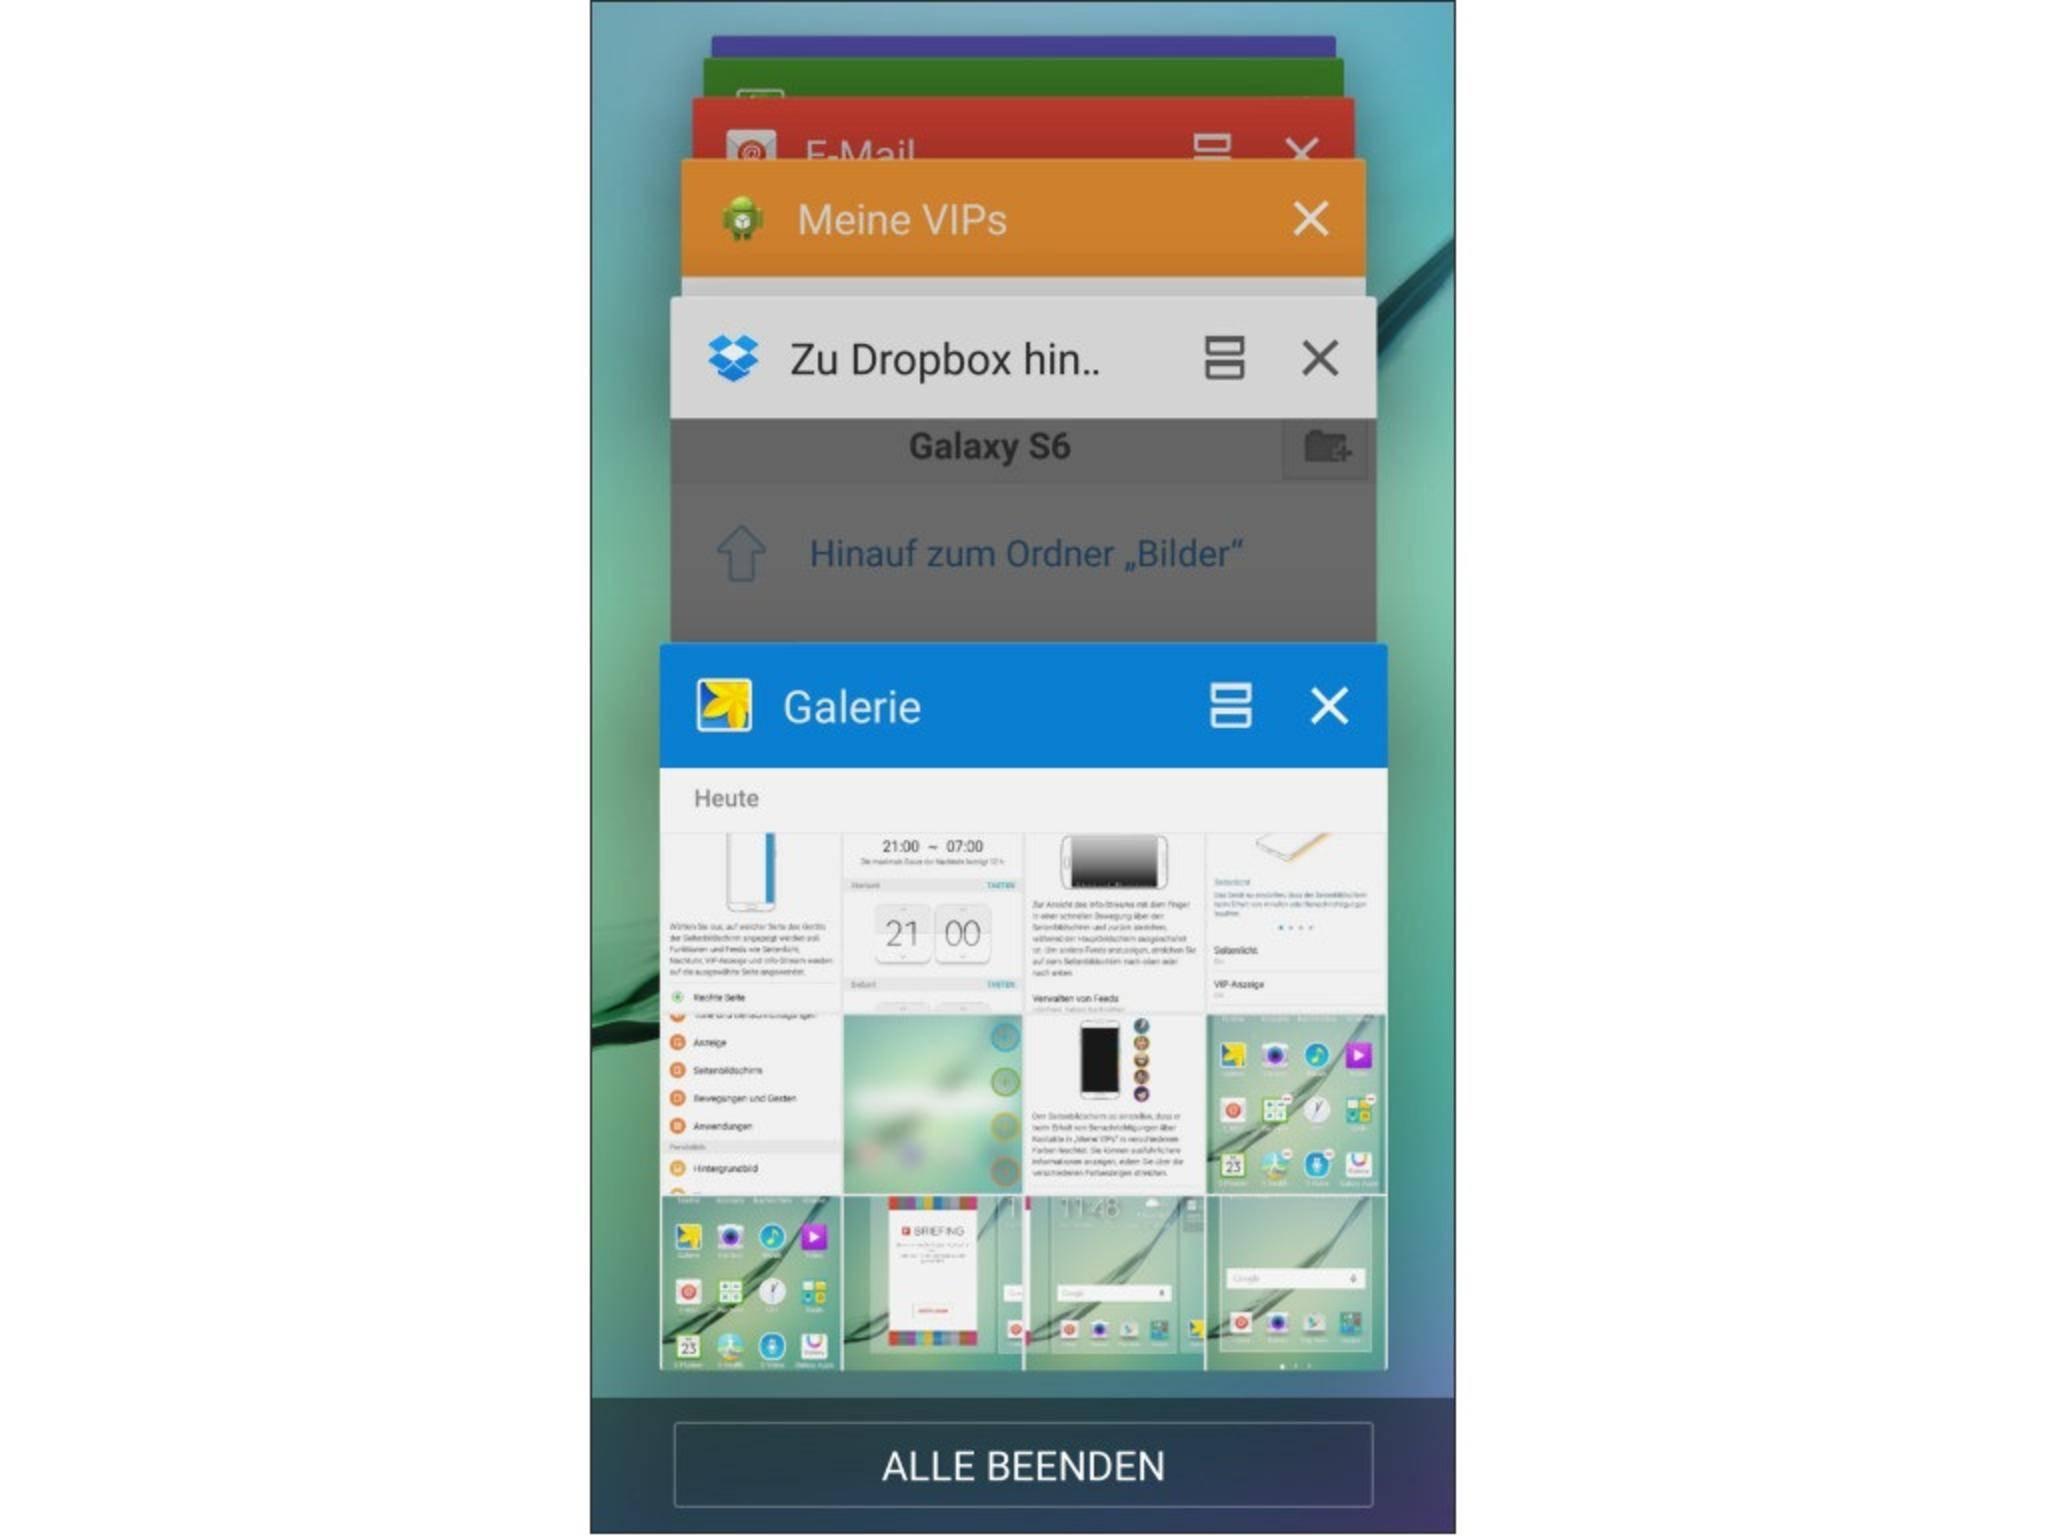 Galaxy S6 Screenshot 19